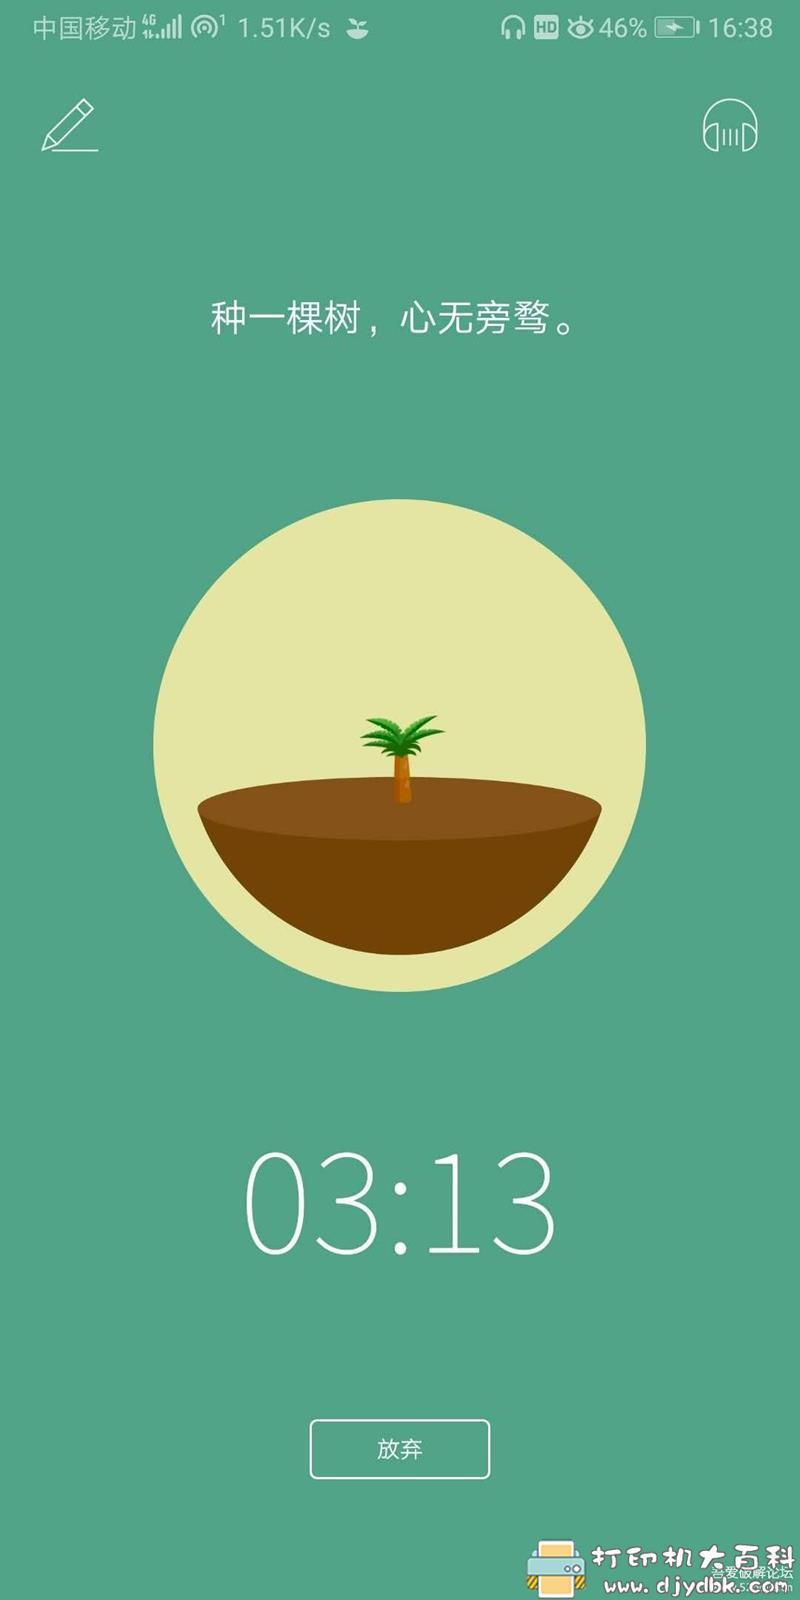 [Android]辅助你放下手机专注工作的app:Forest专注森林 v4.16.1 免费专业版图片 No.3